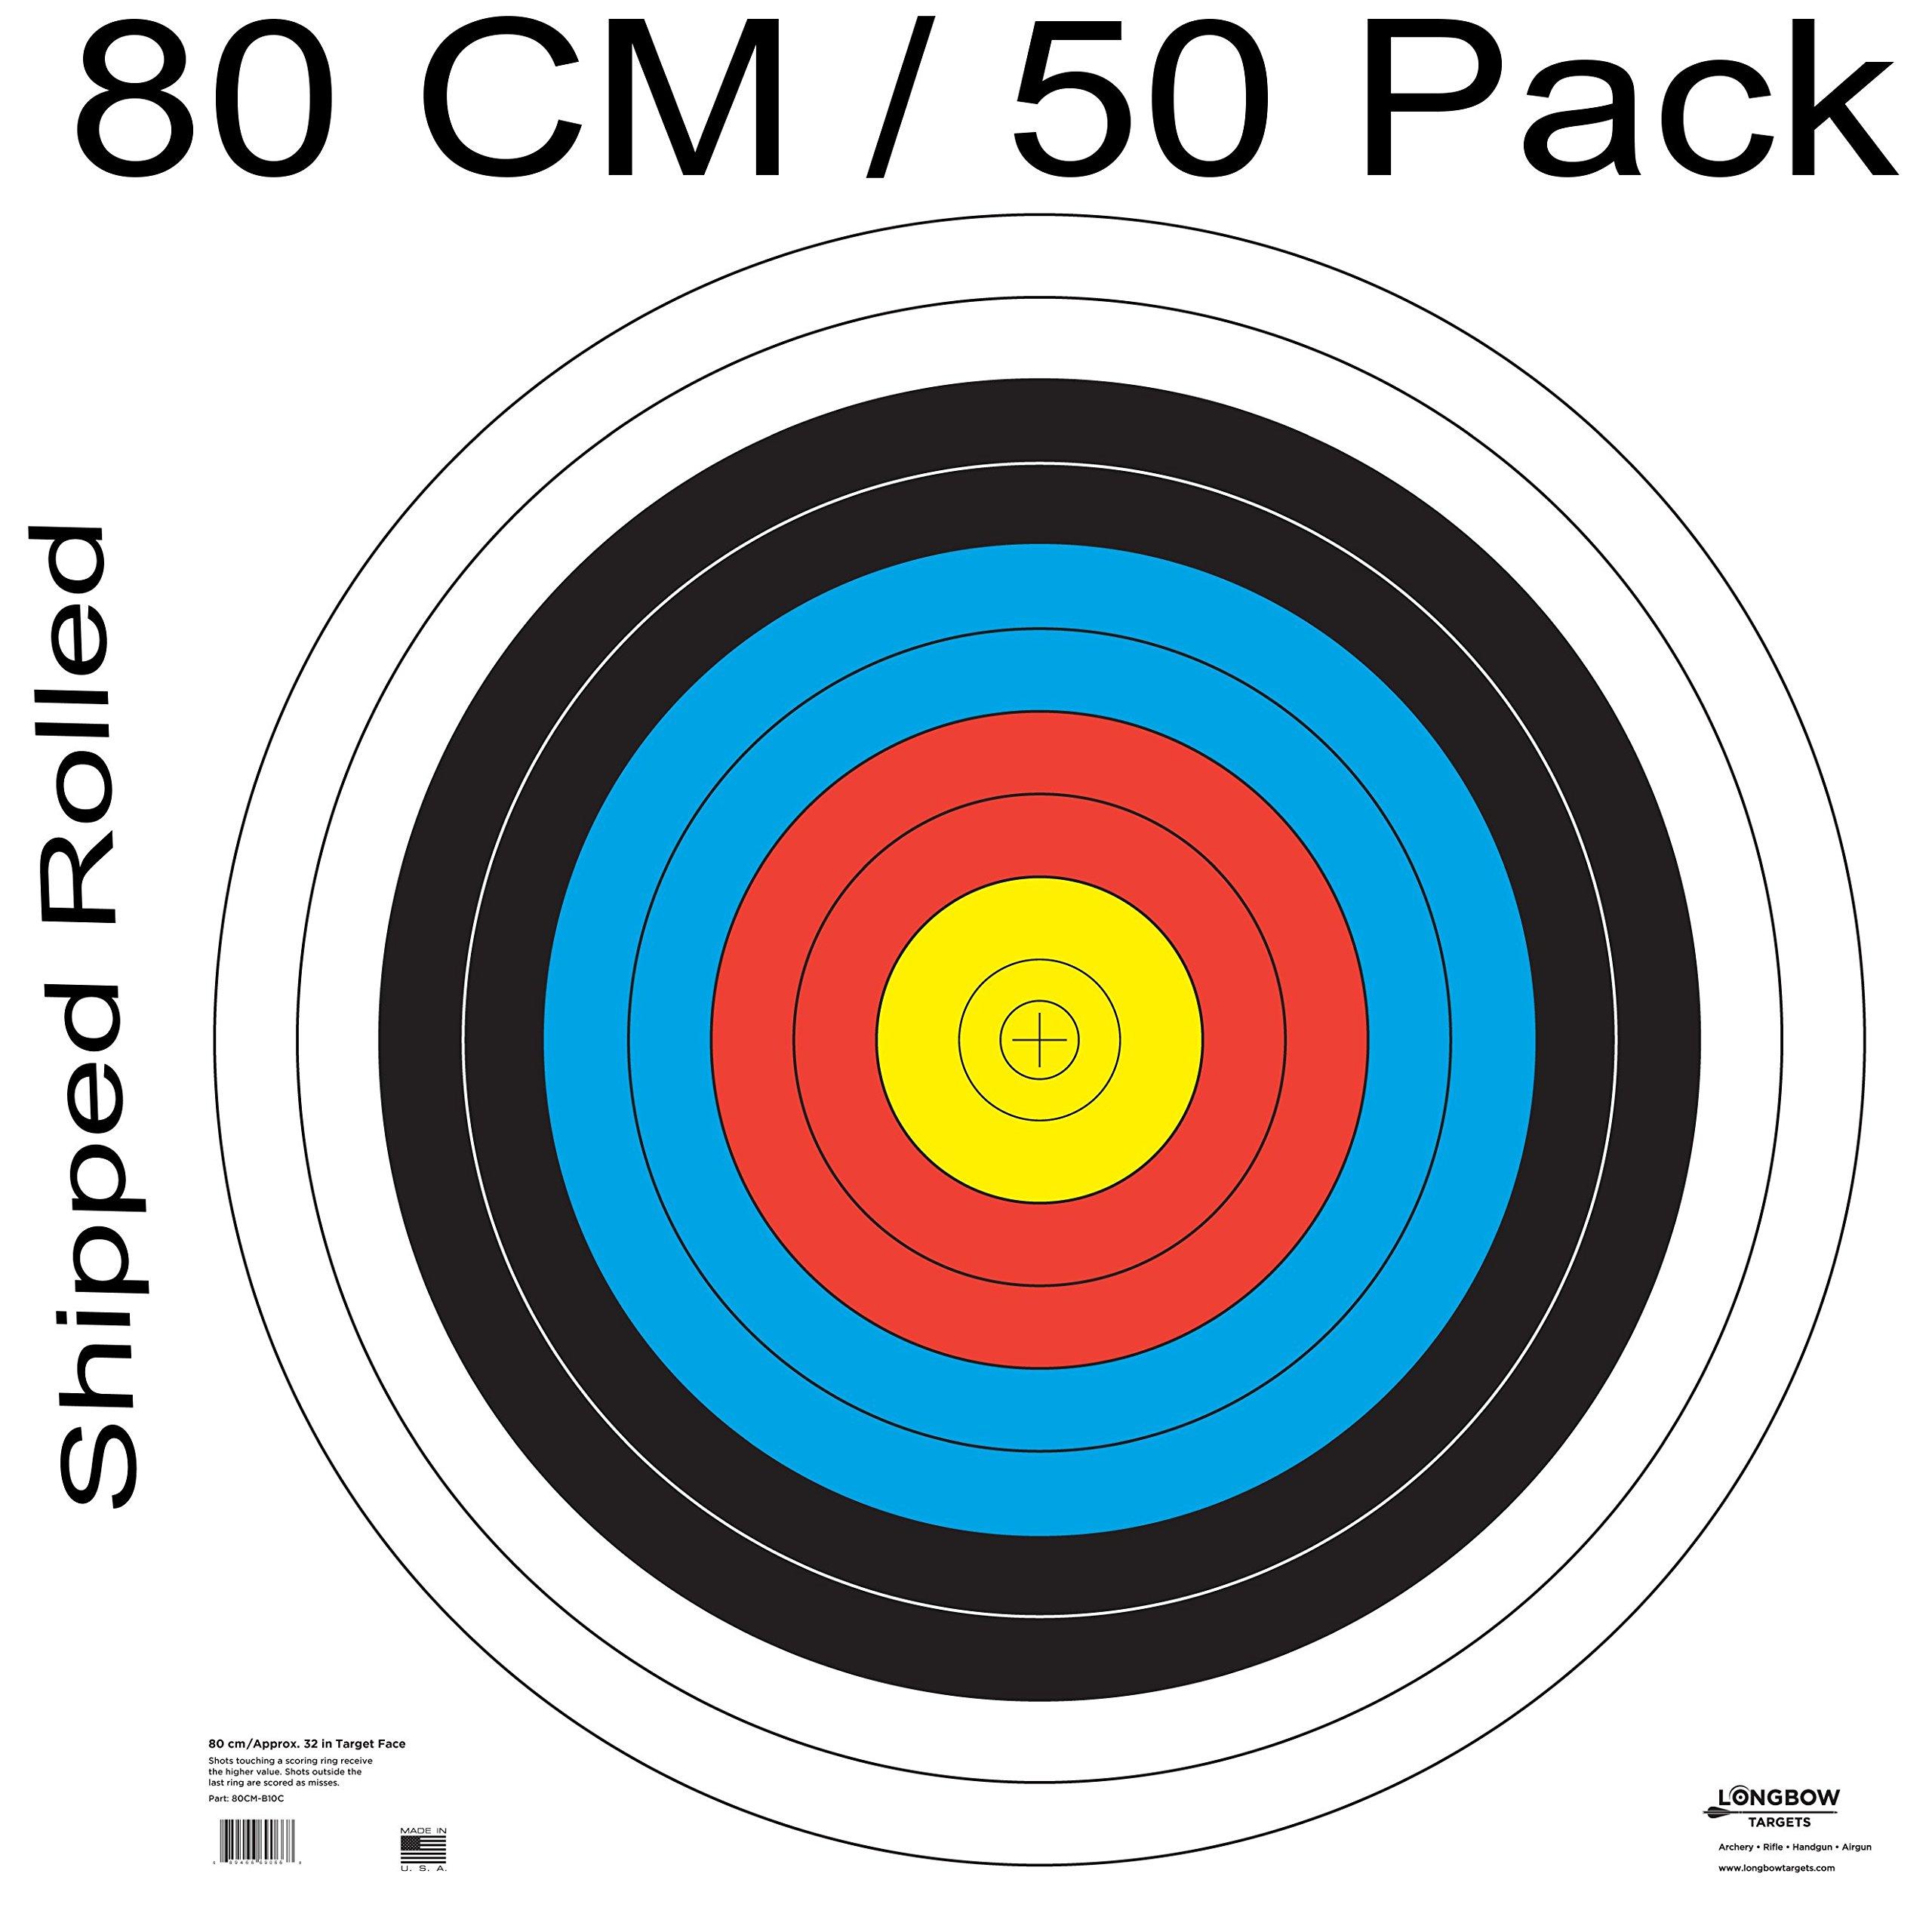 Archery 40cm & 80cm Targets by Longbow (50 pack, 80cm Archery Paper)